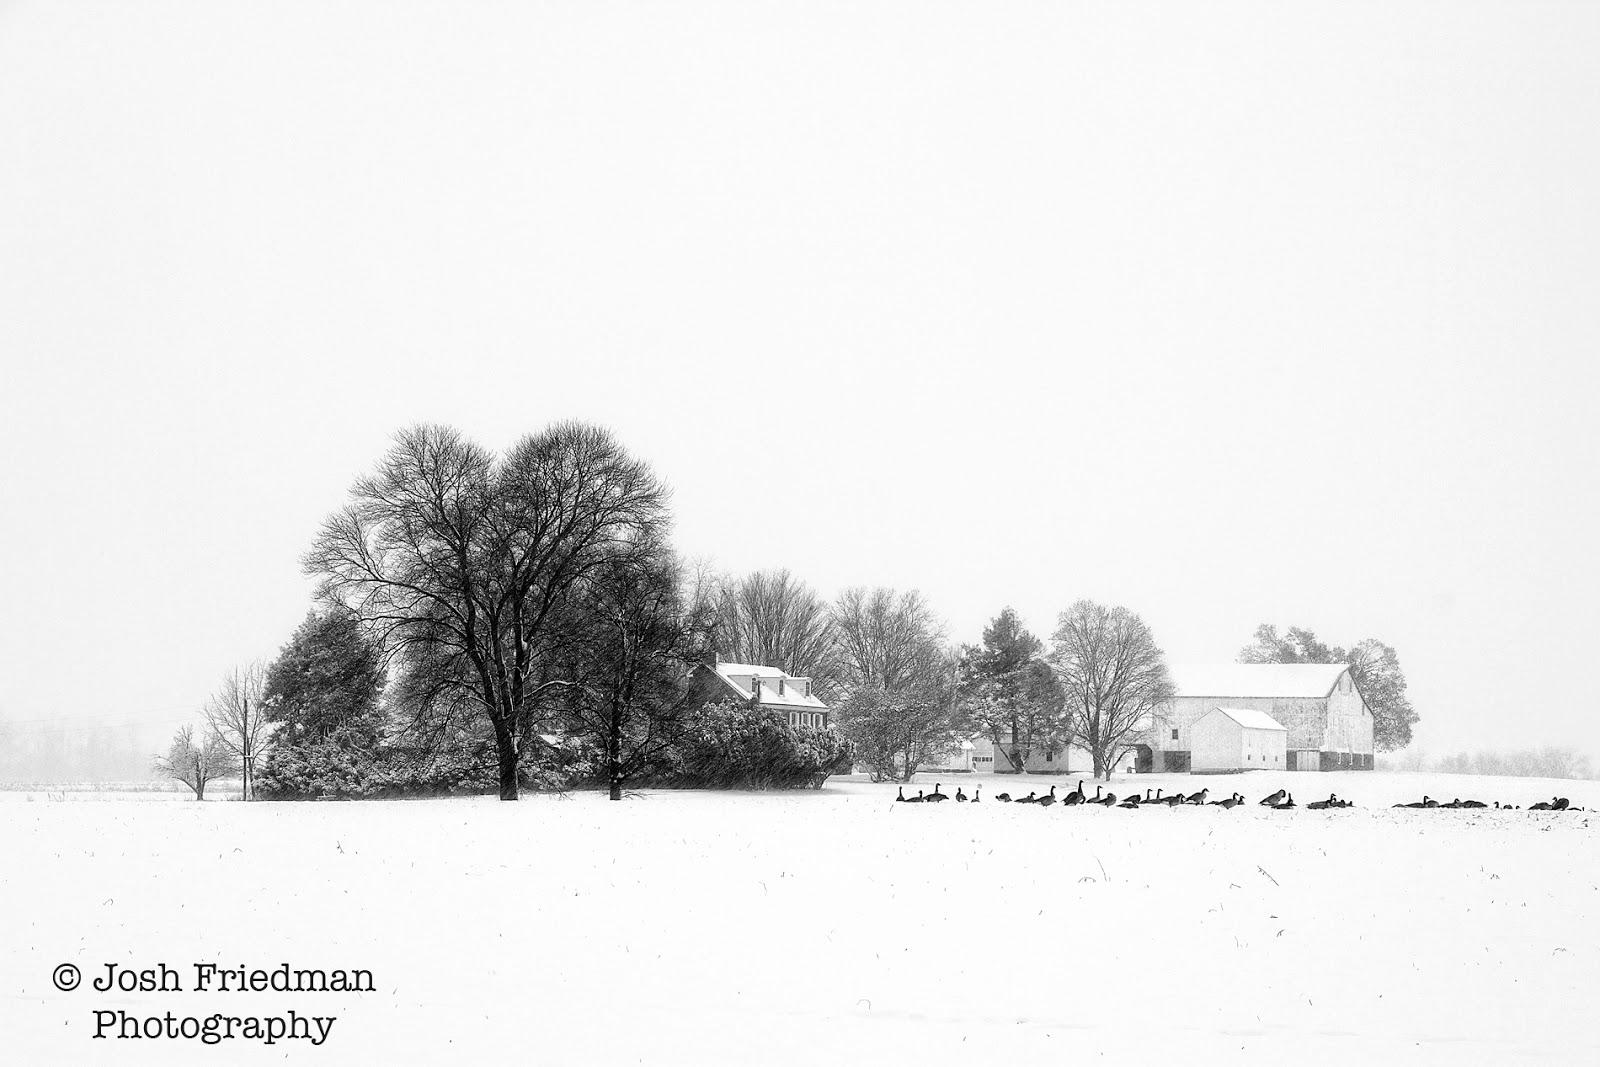 Patterson farm in falling snow yardley pennsylvania 12 9 17